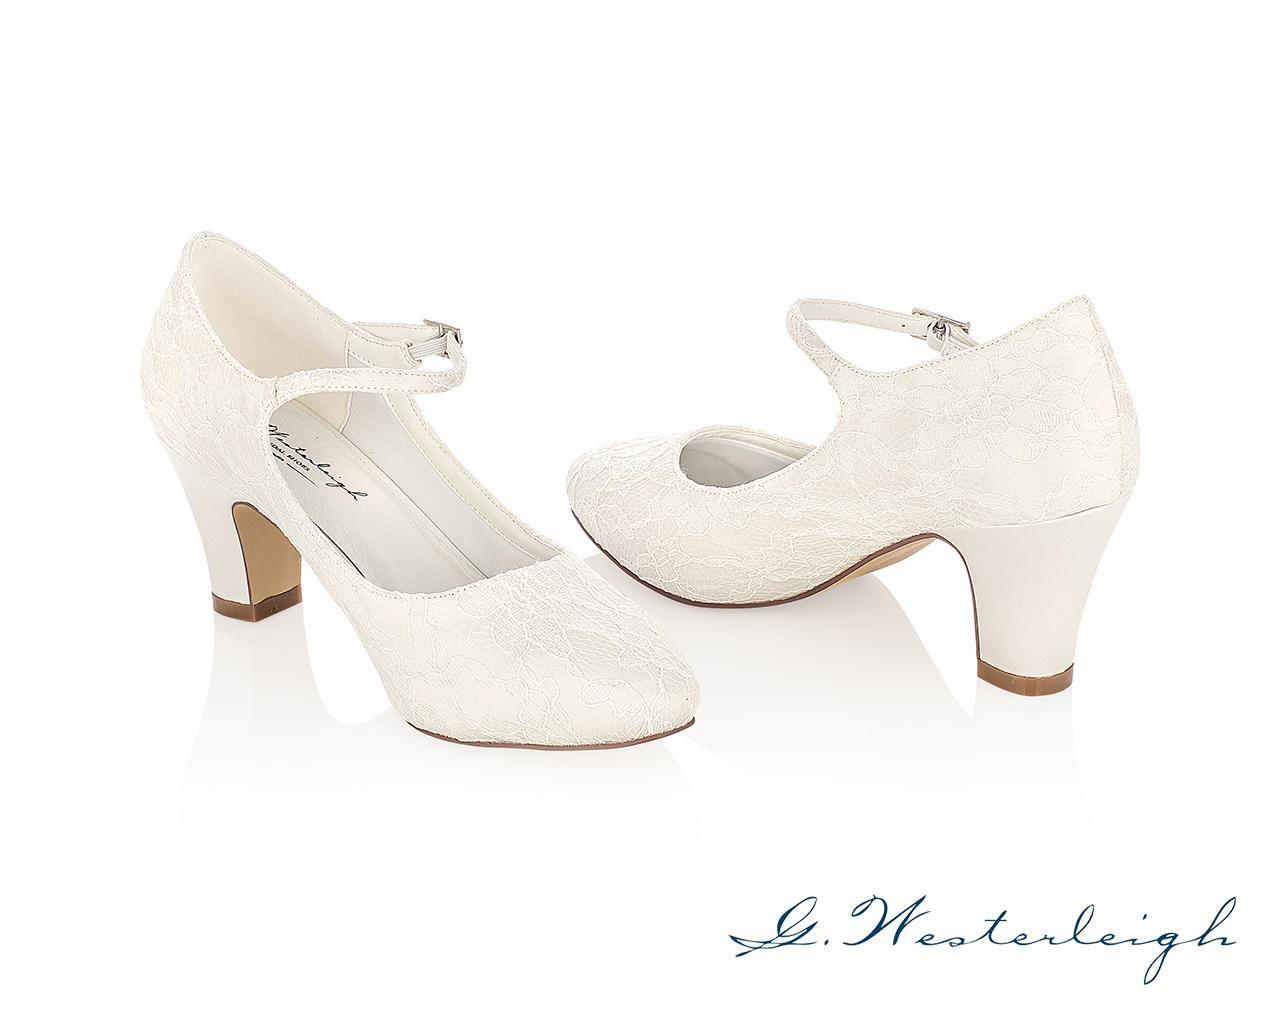 Svadobné topánky Agnes - Obrázok č. 1